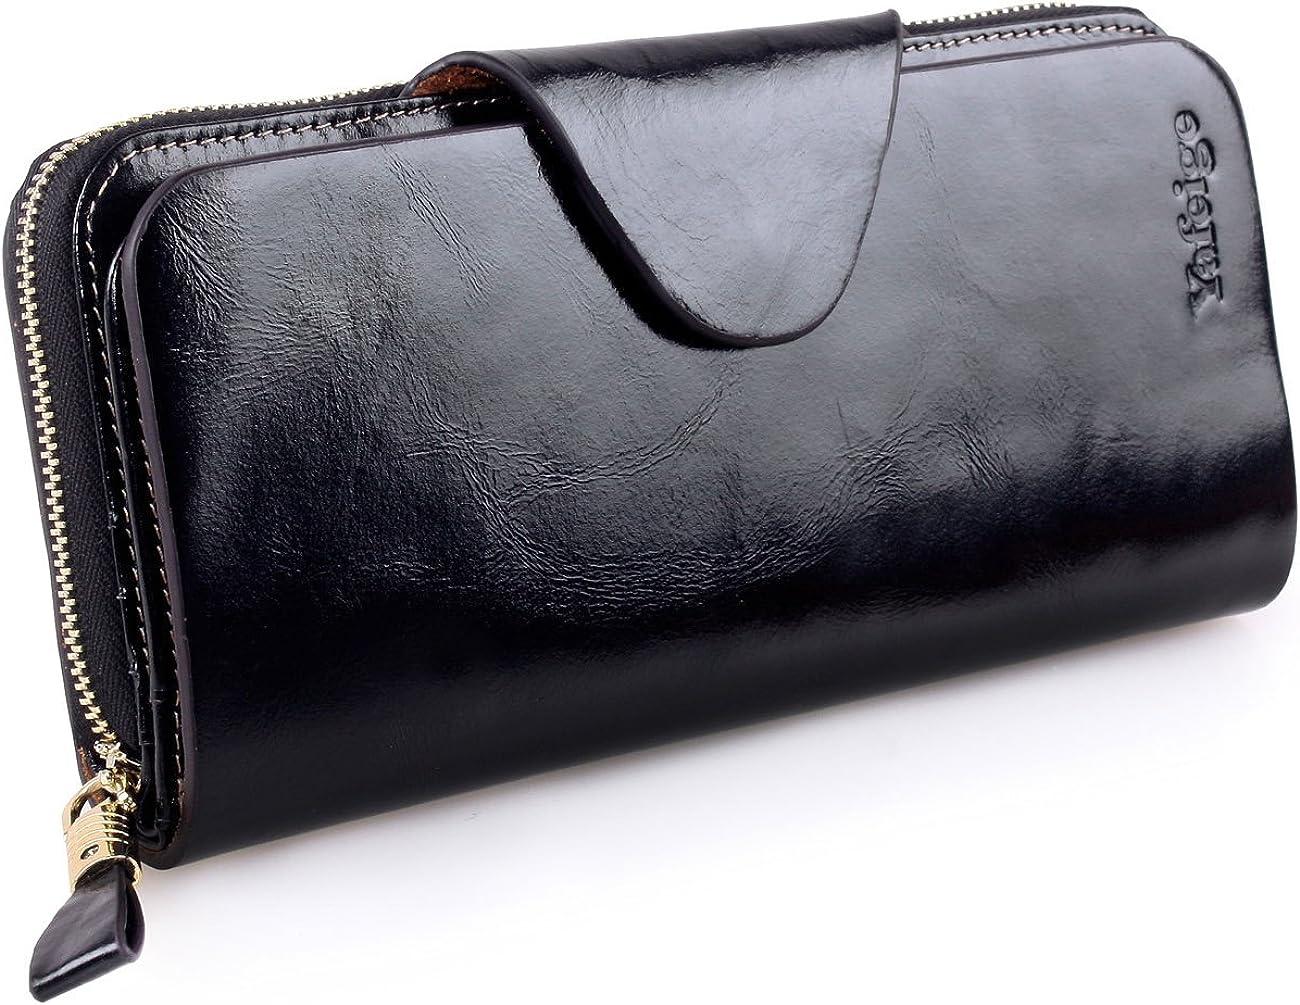 Yafeige Large Luxury Women's RFID Blocking Tri-fold Leather Wallet Zipper Ladies Clutch Purse